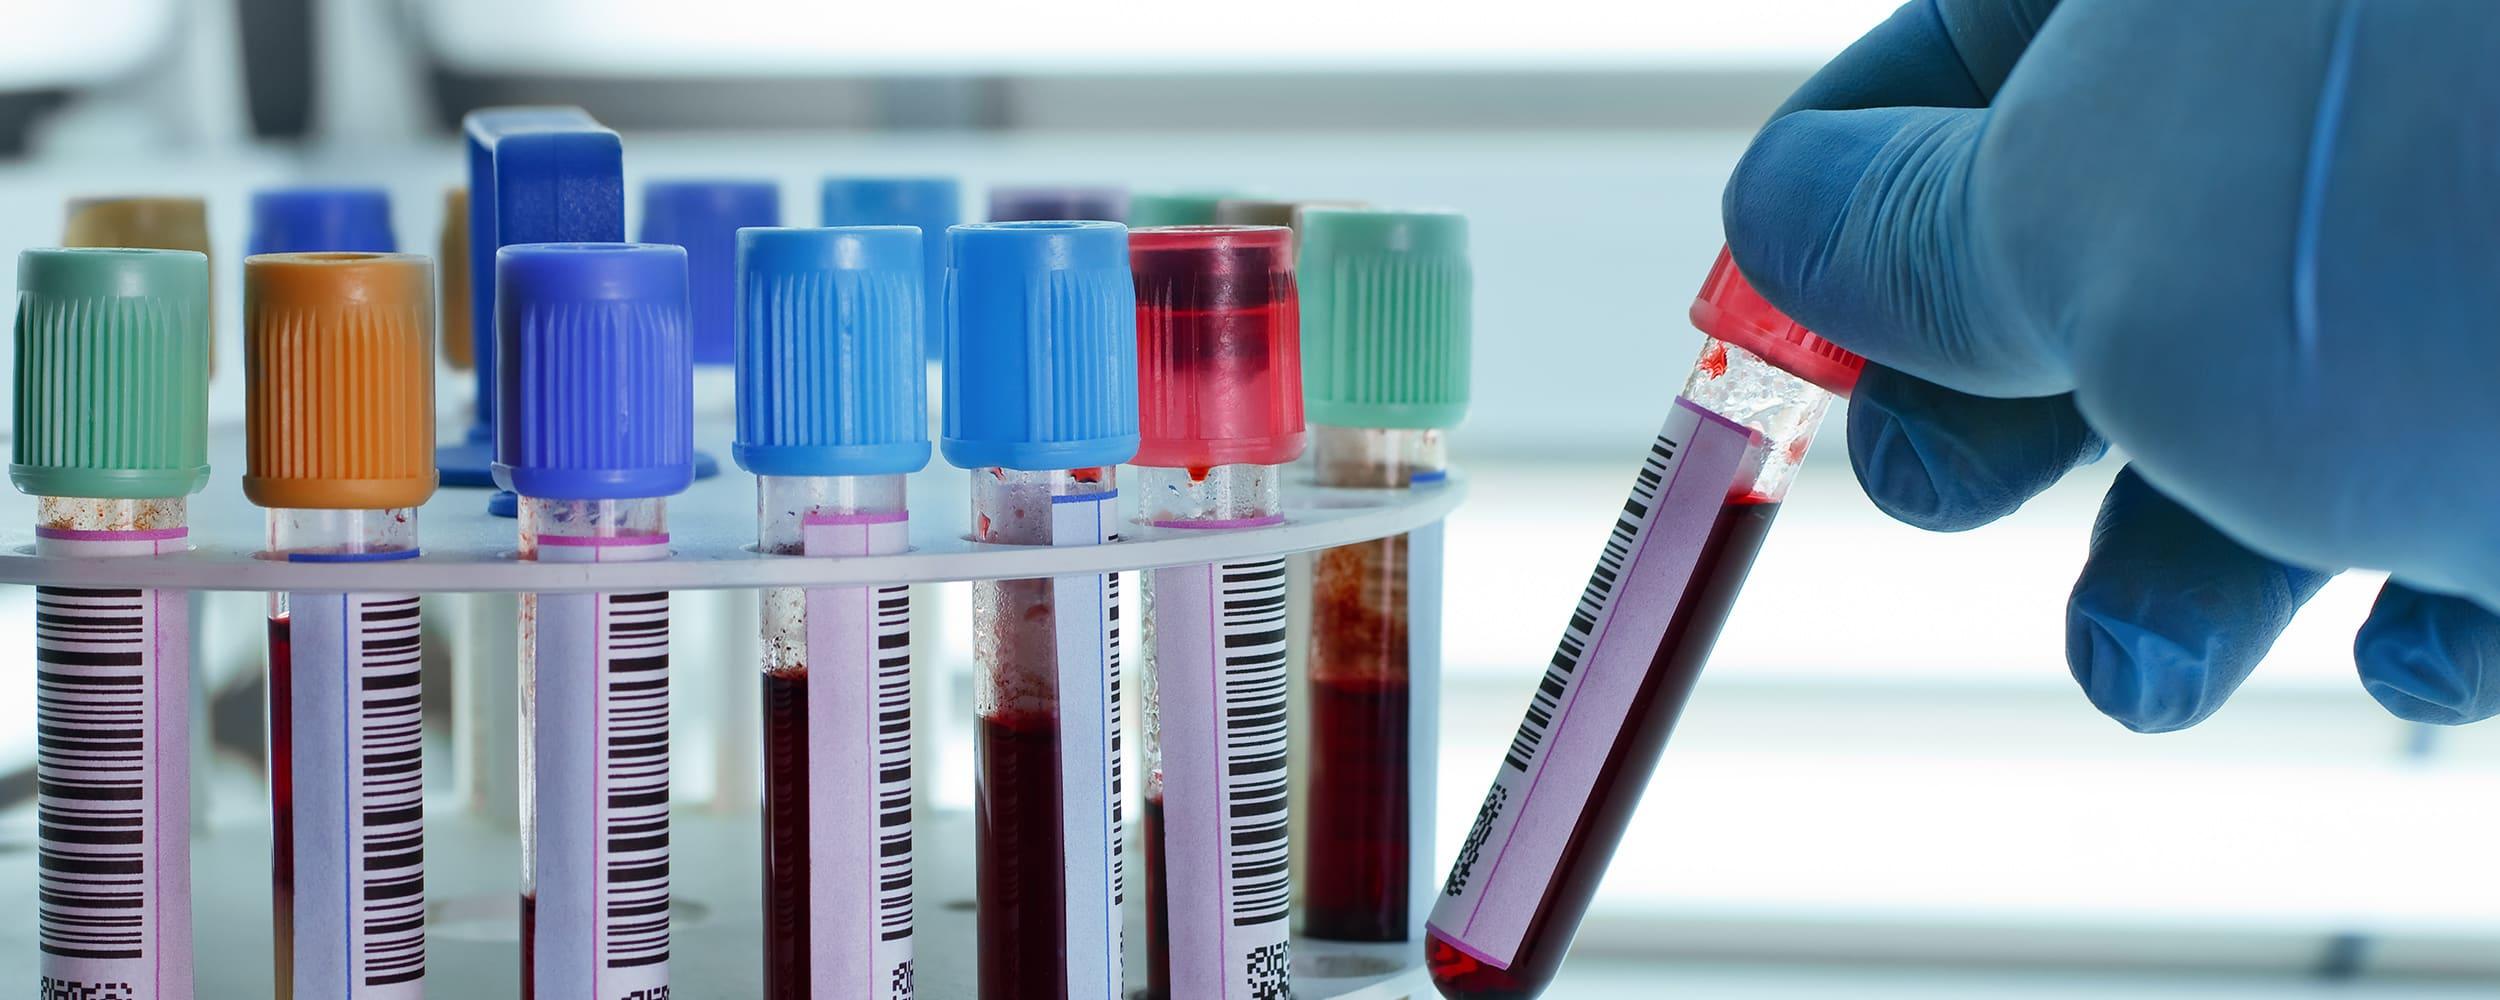 congress on blood transfusion